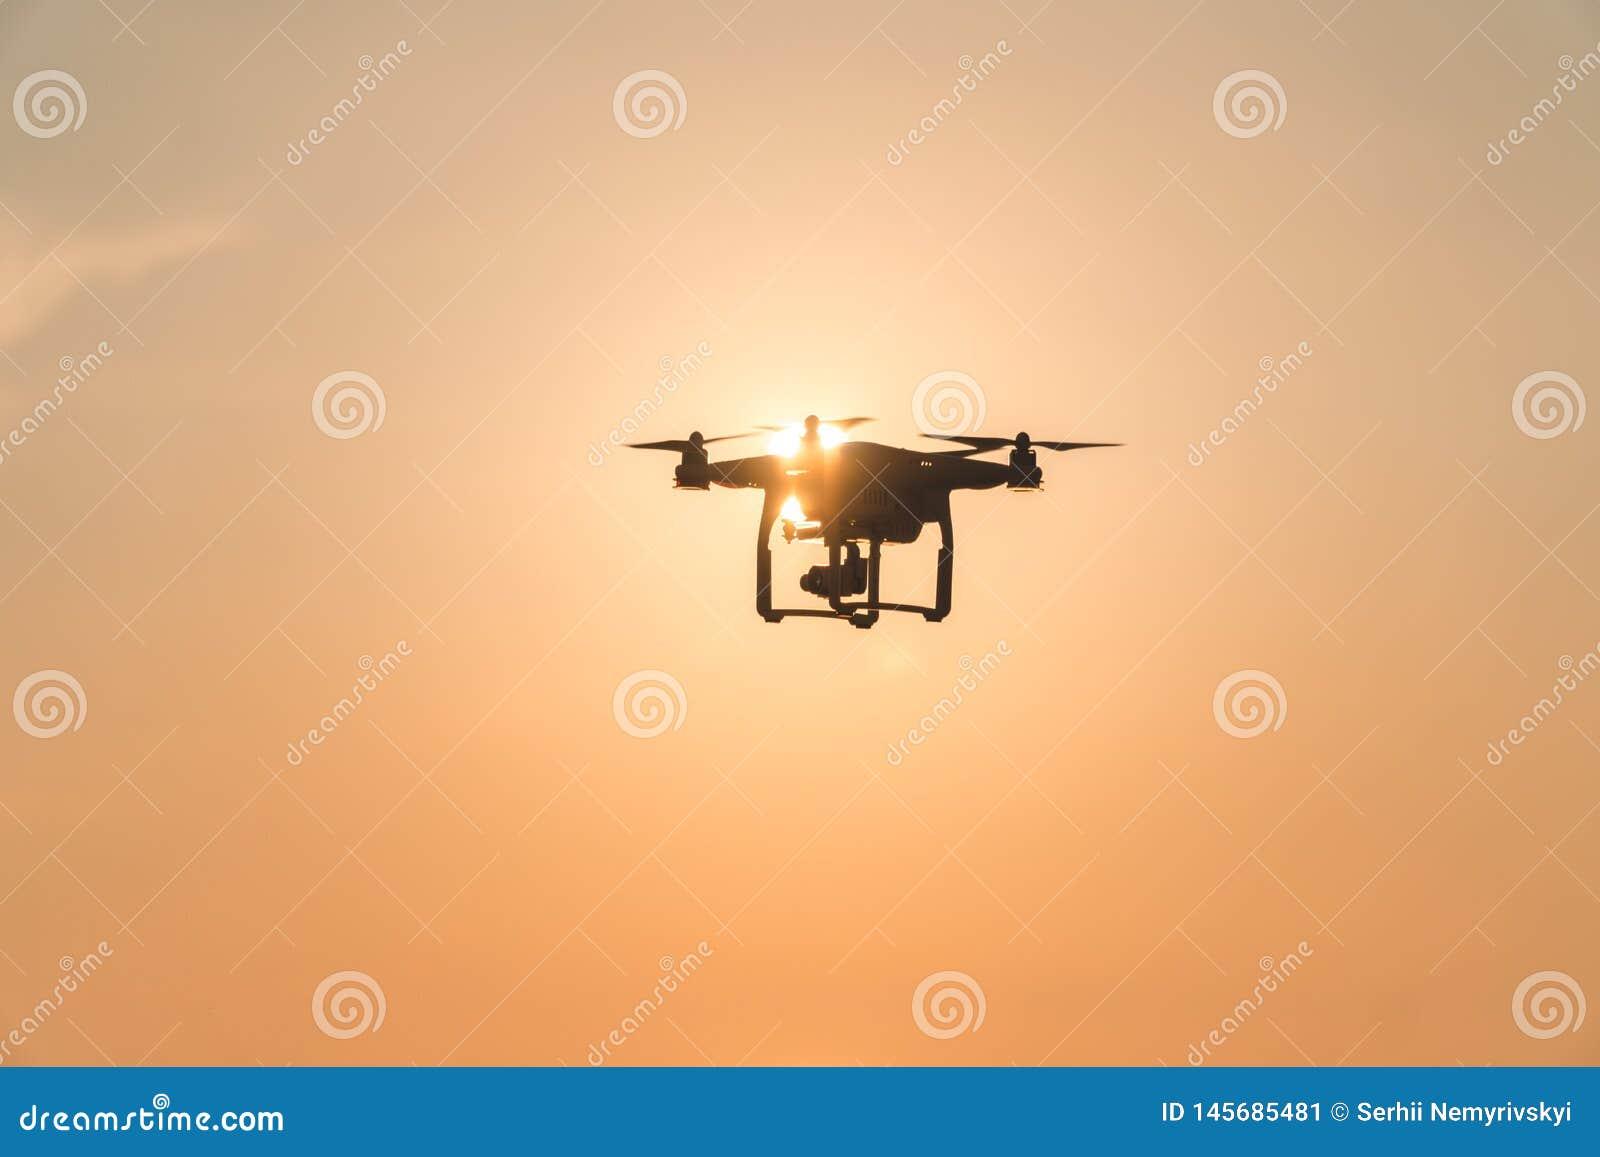 Surret i solnedg?nghimlen berg f?r havv?g st?nger sig upp av quadrocopter utomhus begrepp f?r videography f?r br?llop f?r filmtil